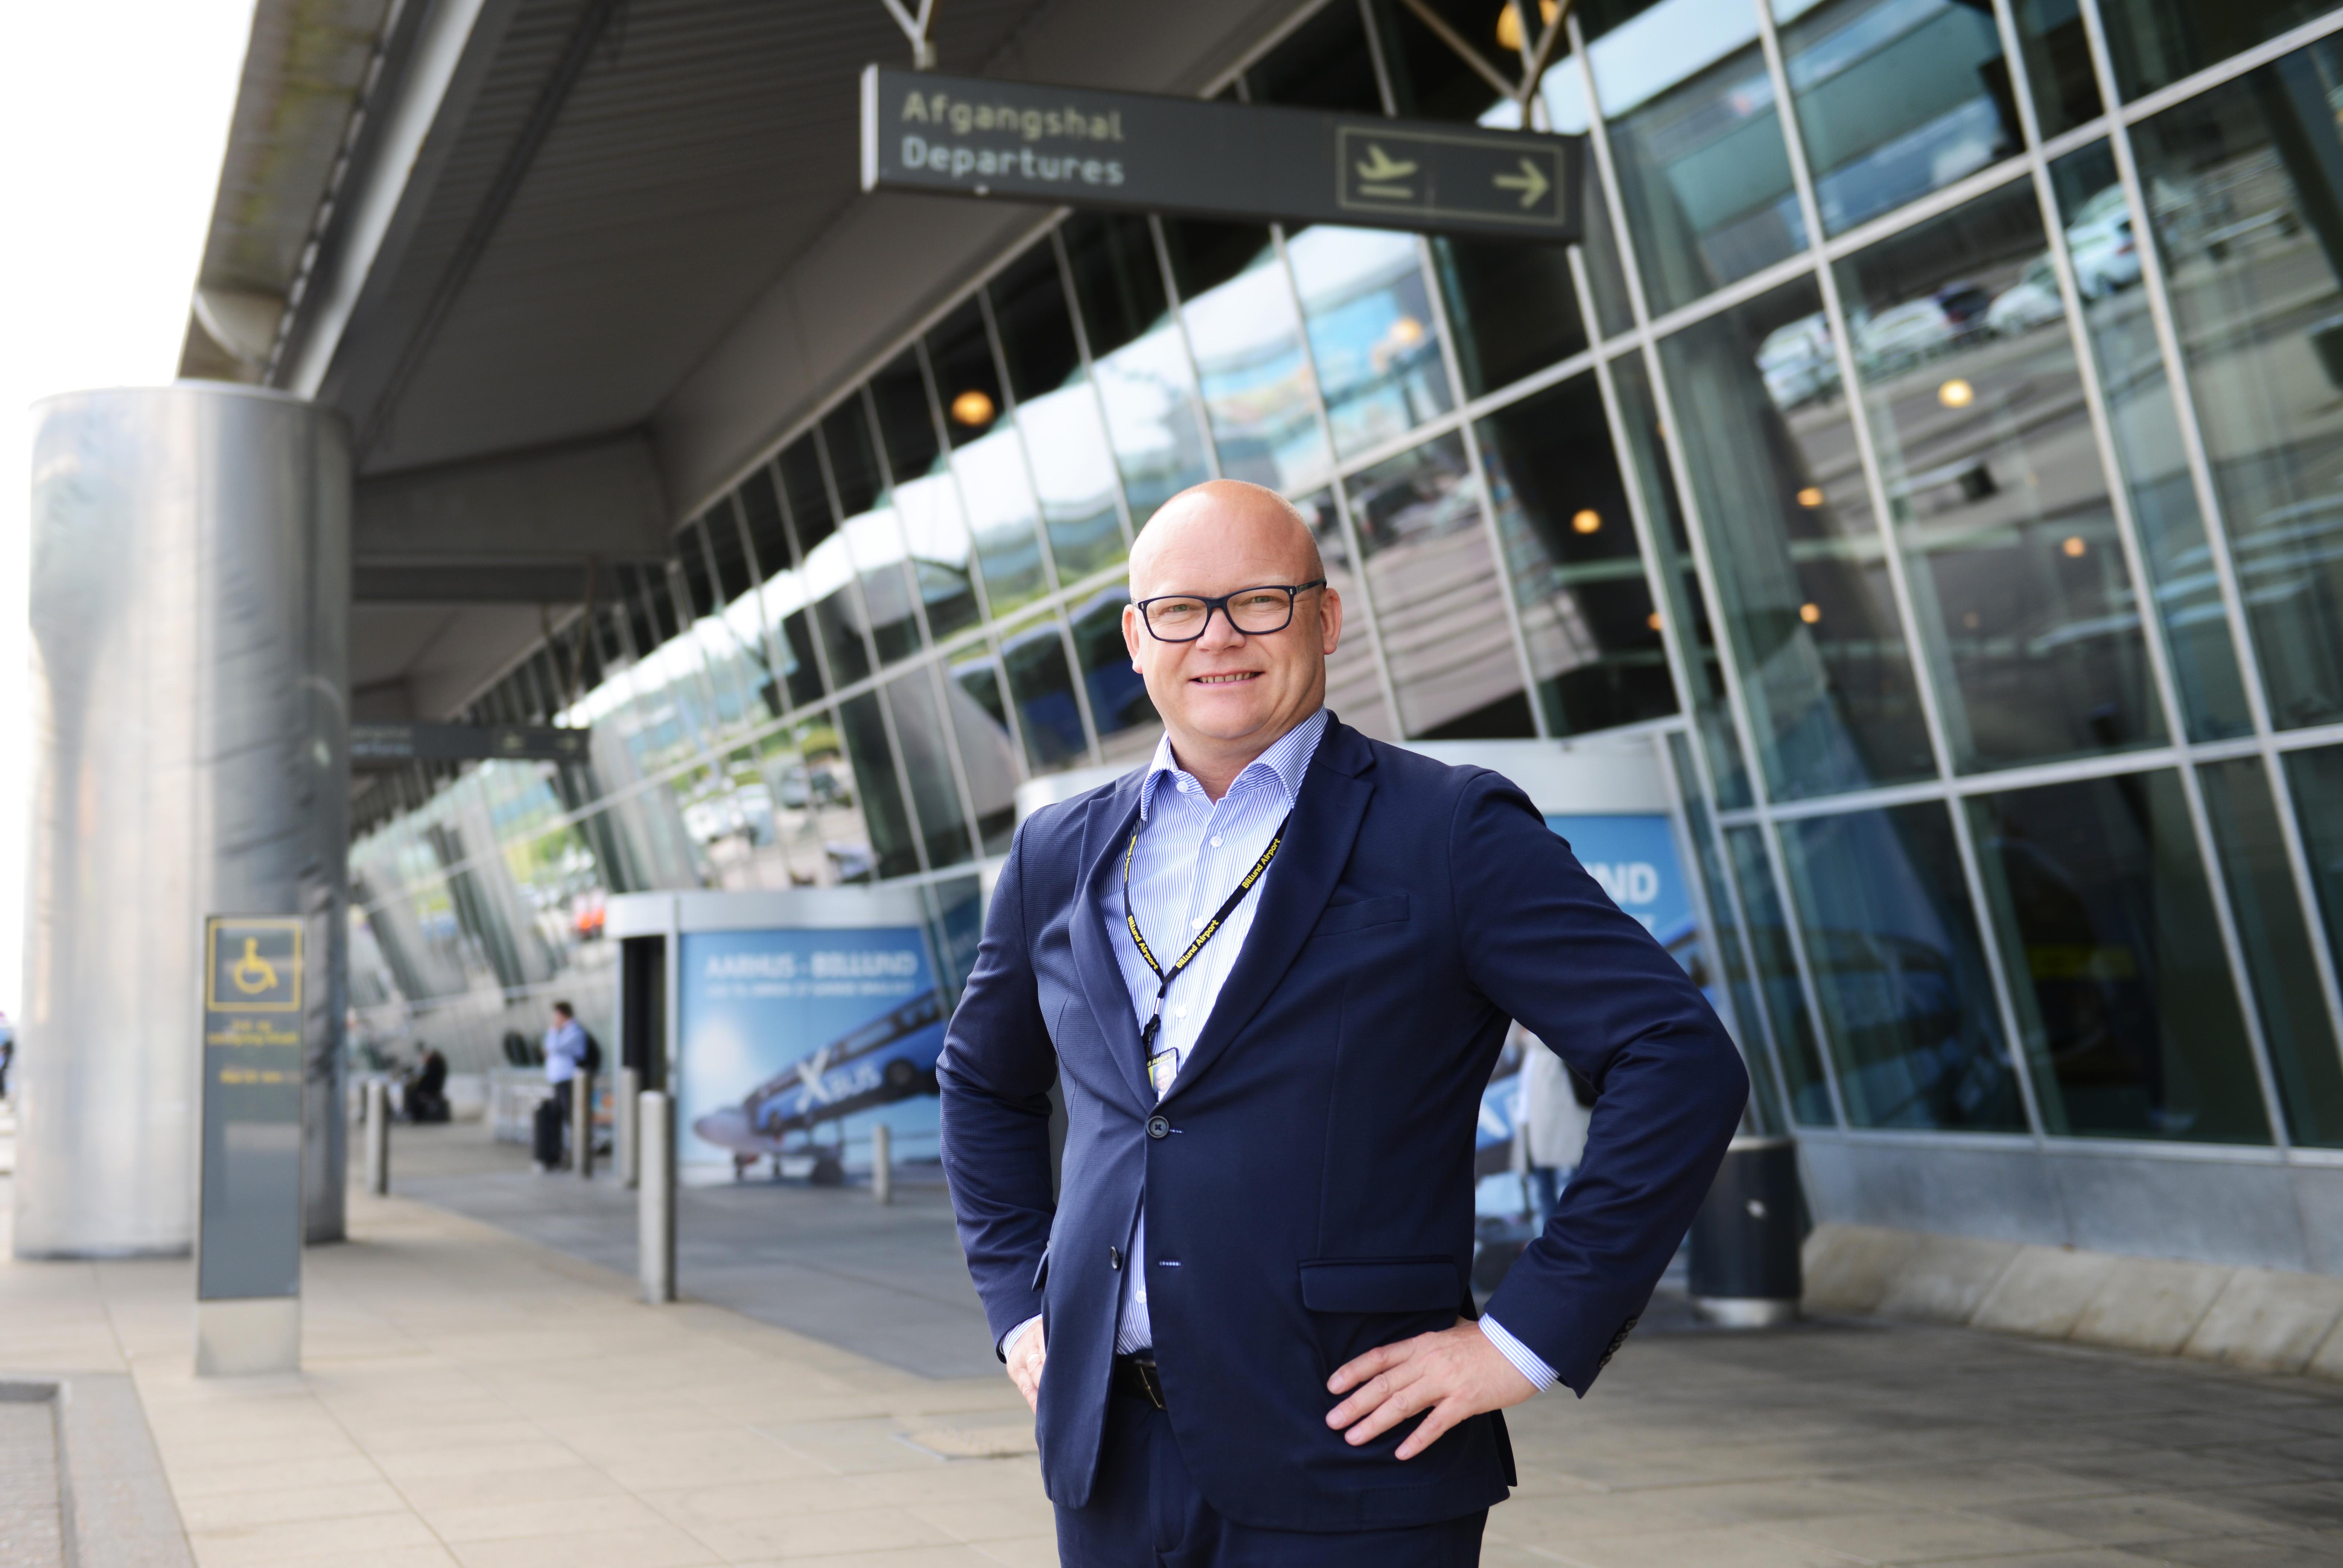 Lufthavnsdirektør i Billund lufthavn Jan Hessellund. (Foto: Joakim J. Hvistendahl)